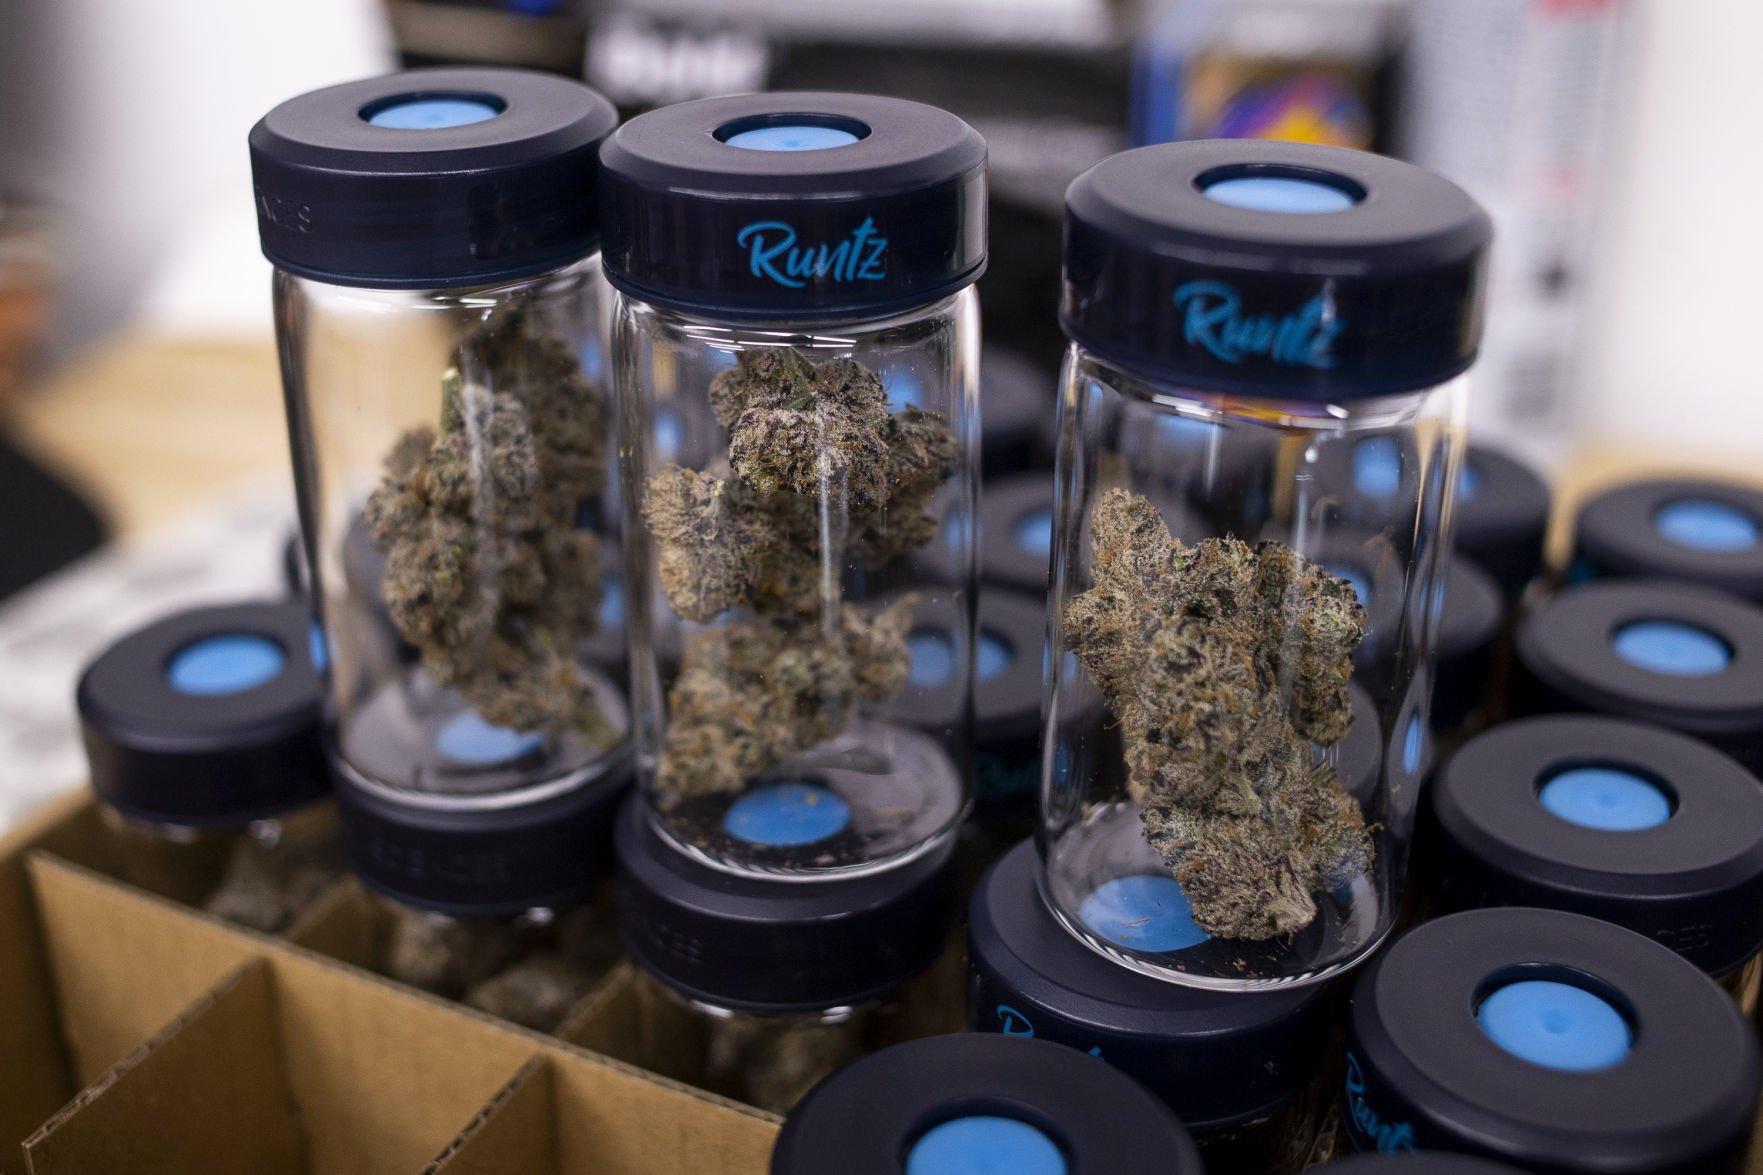 tucson.com - By Howard Fischer Capitol Media Services - Medical marijuana consumption in Arizona in 2020: 106 tons